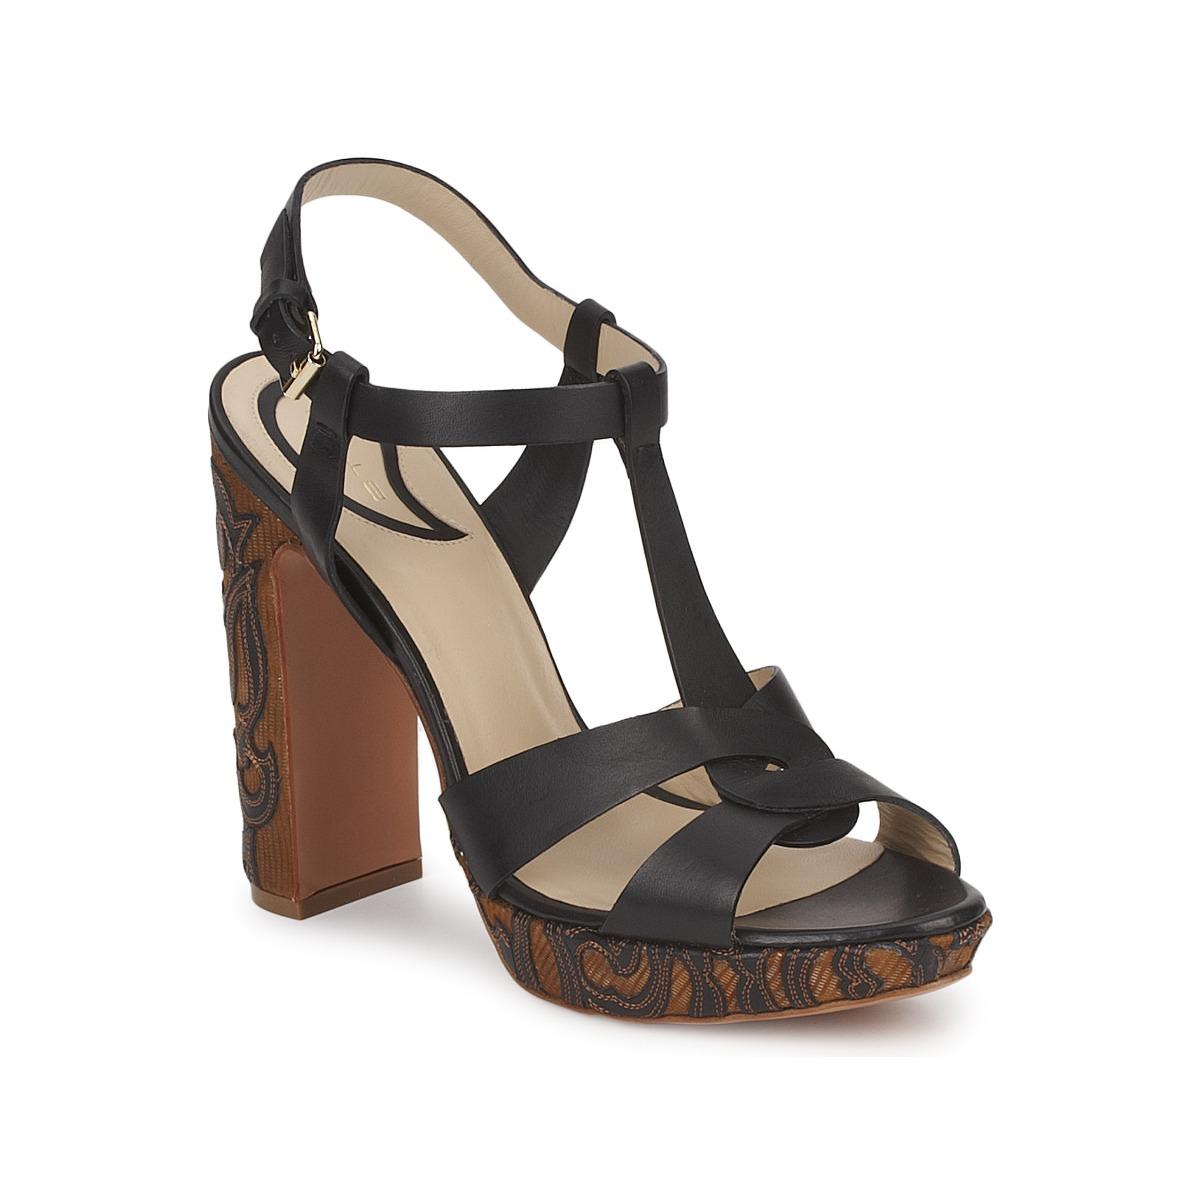 Sandale Etro NU-PIEDS 3763 Noir